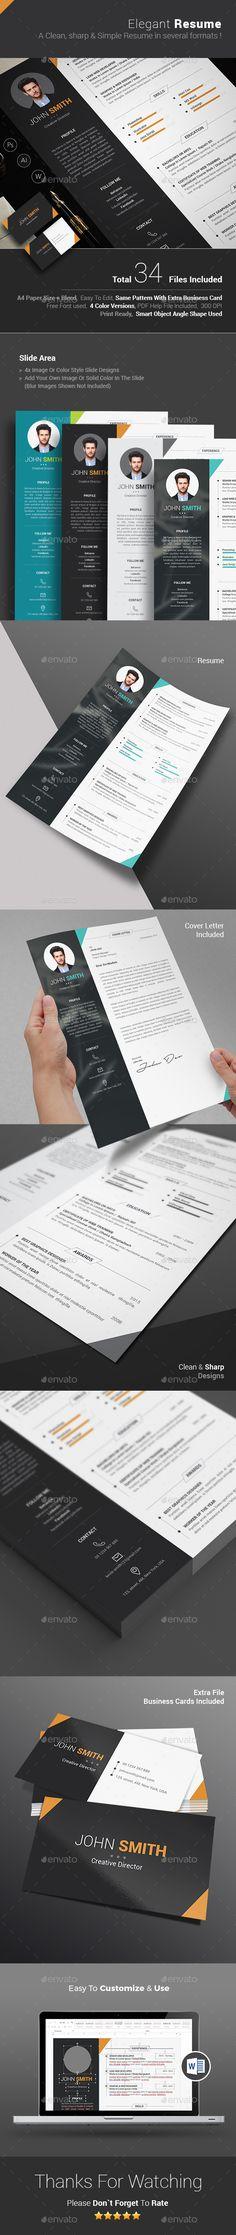 Resume Cv template Resume cv